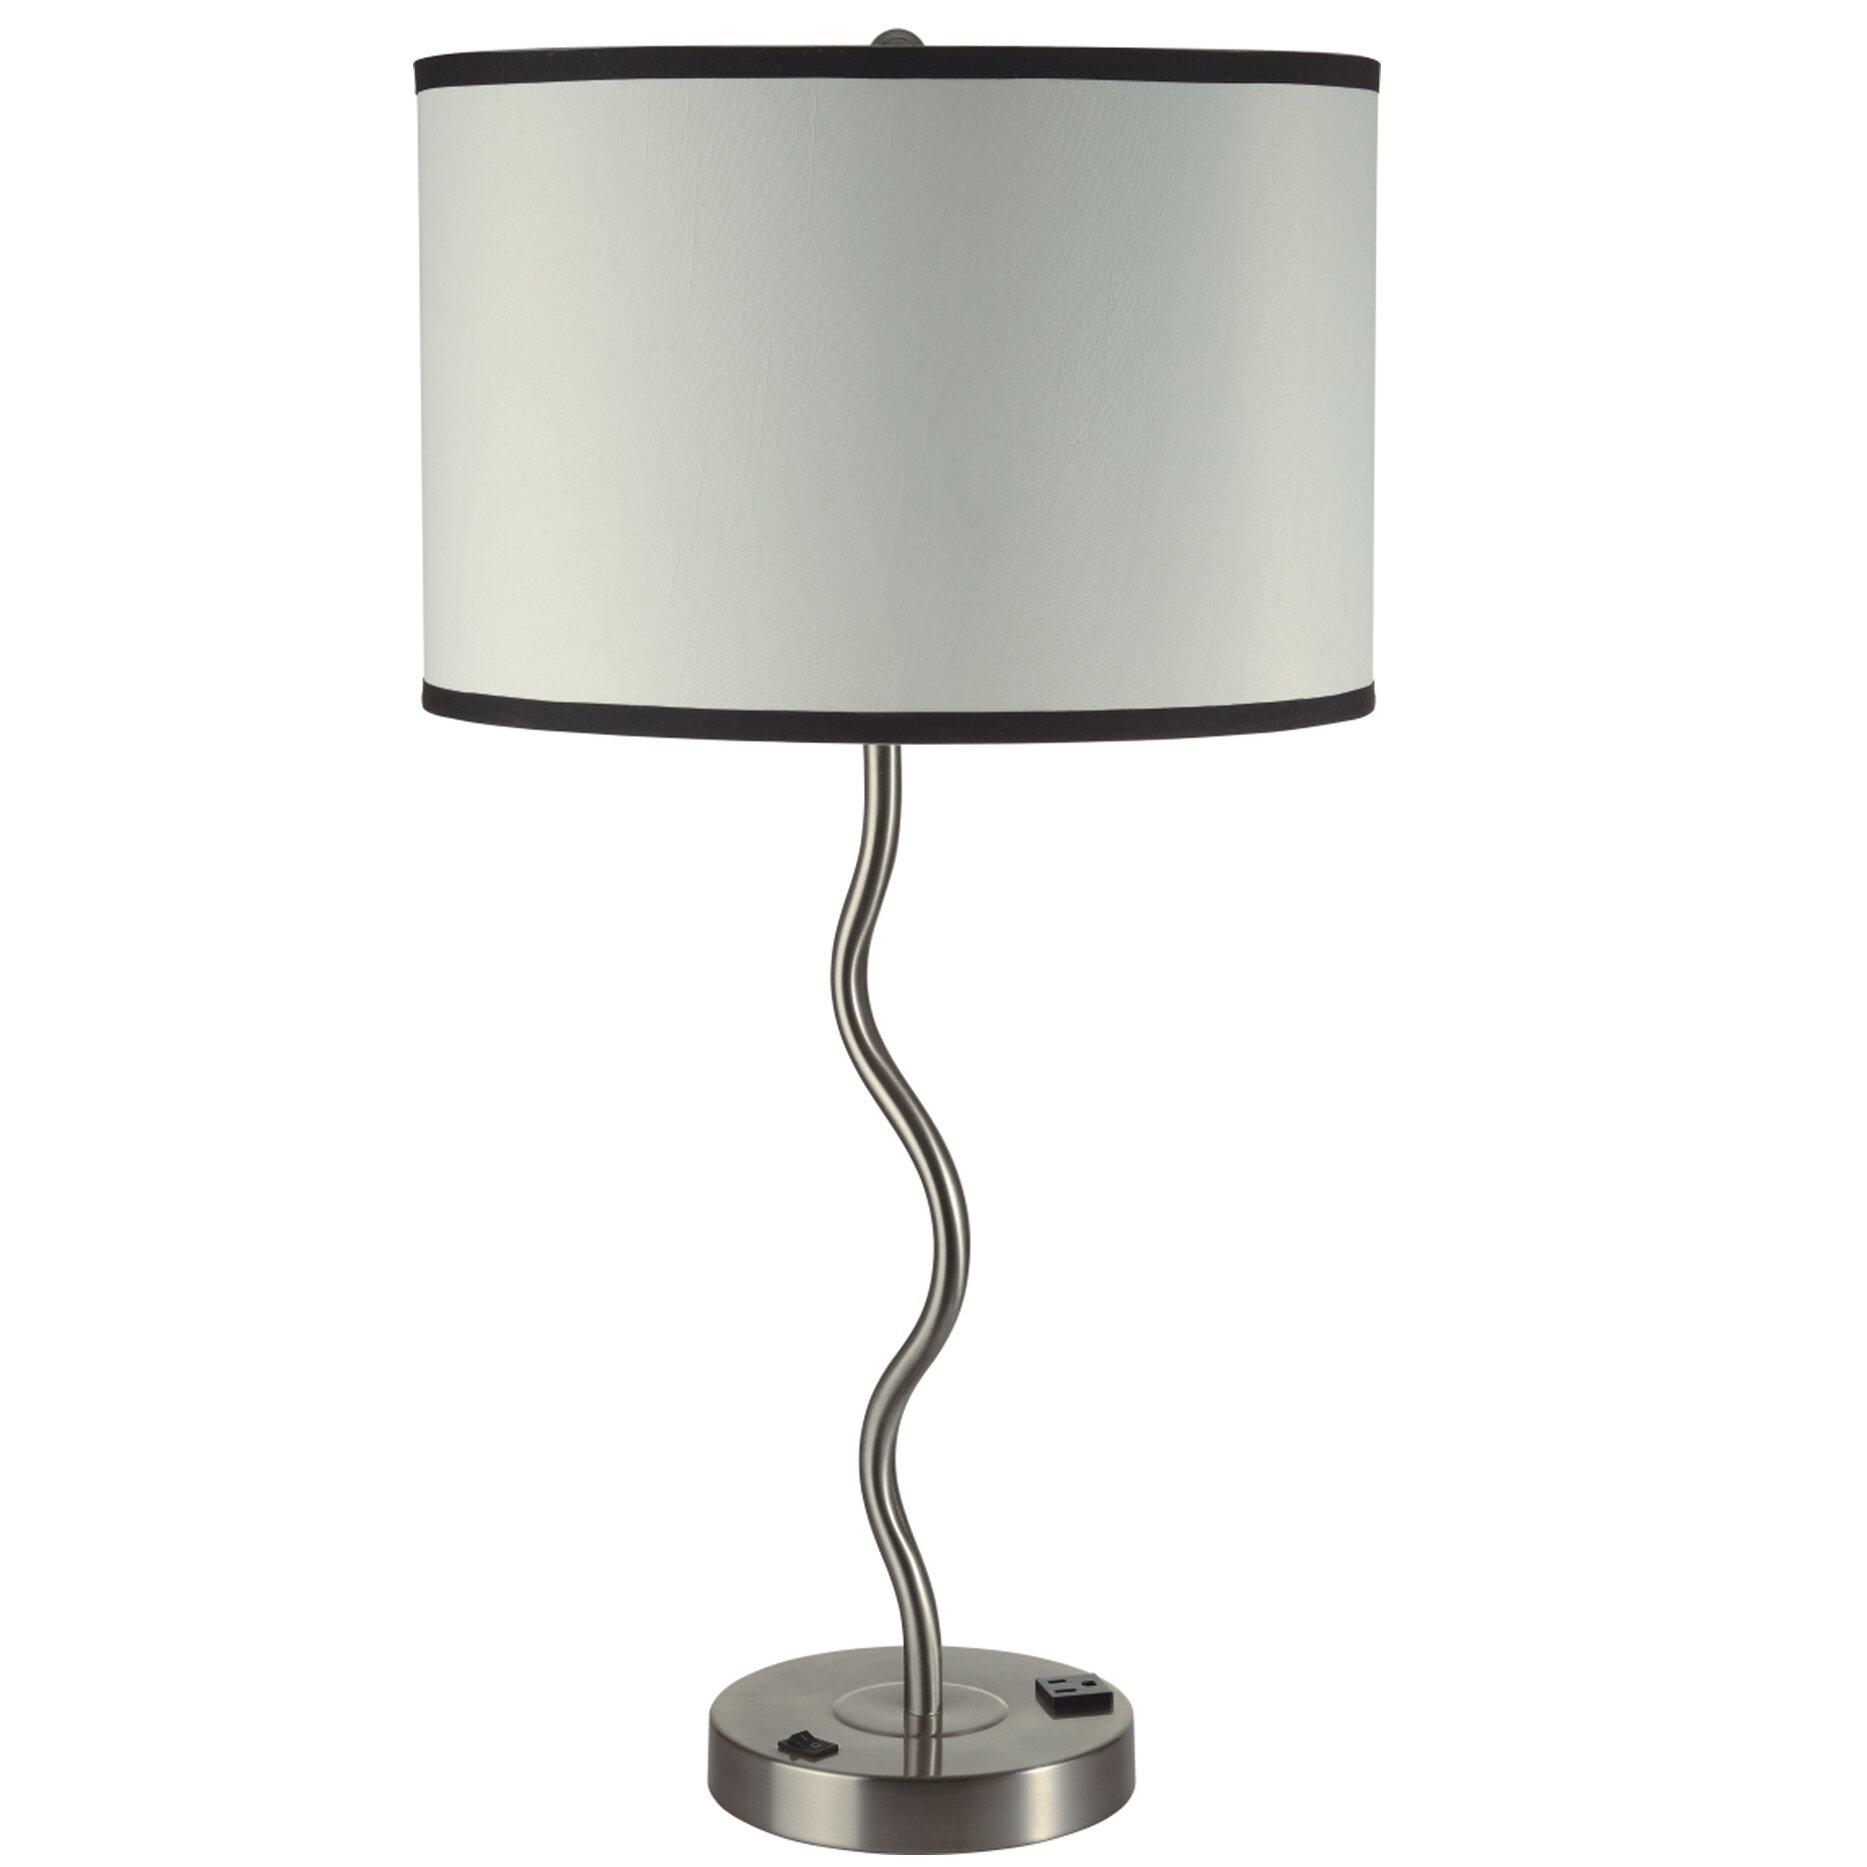 ore furniture wave 28 table lamp reviews wayfair. Black Bedroom Furniture Sets. Home Design Ideas